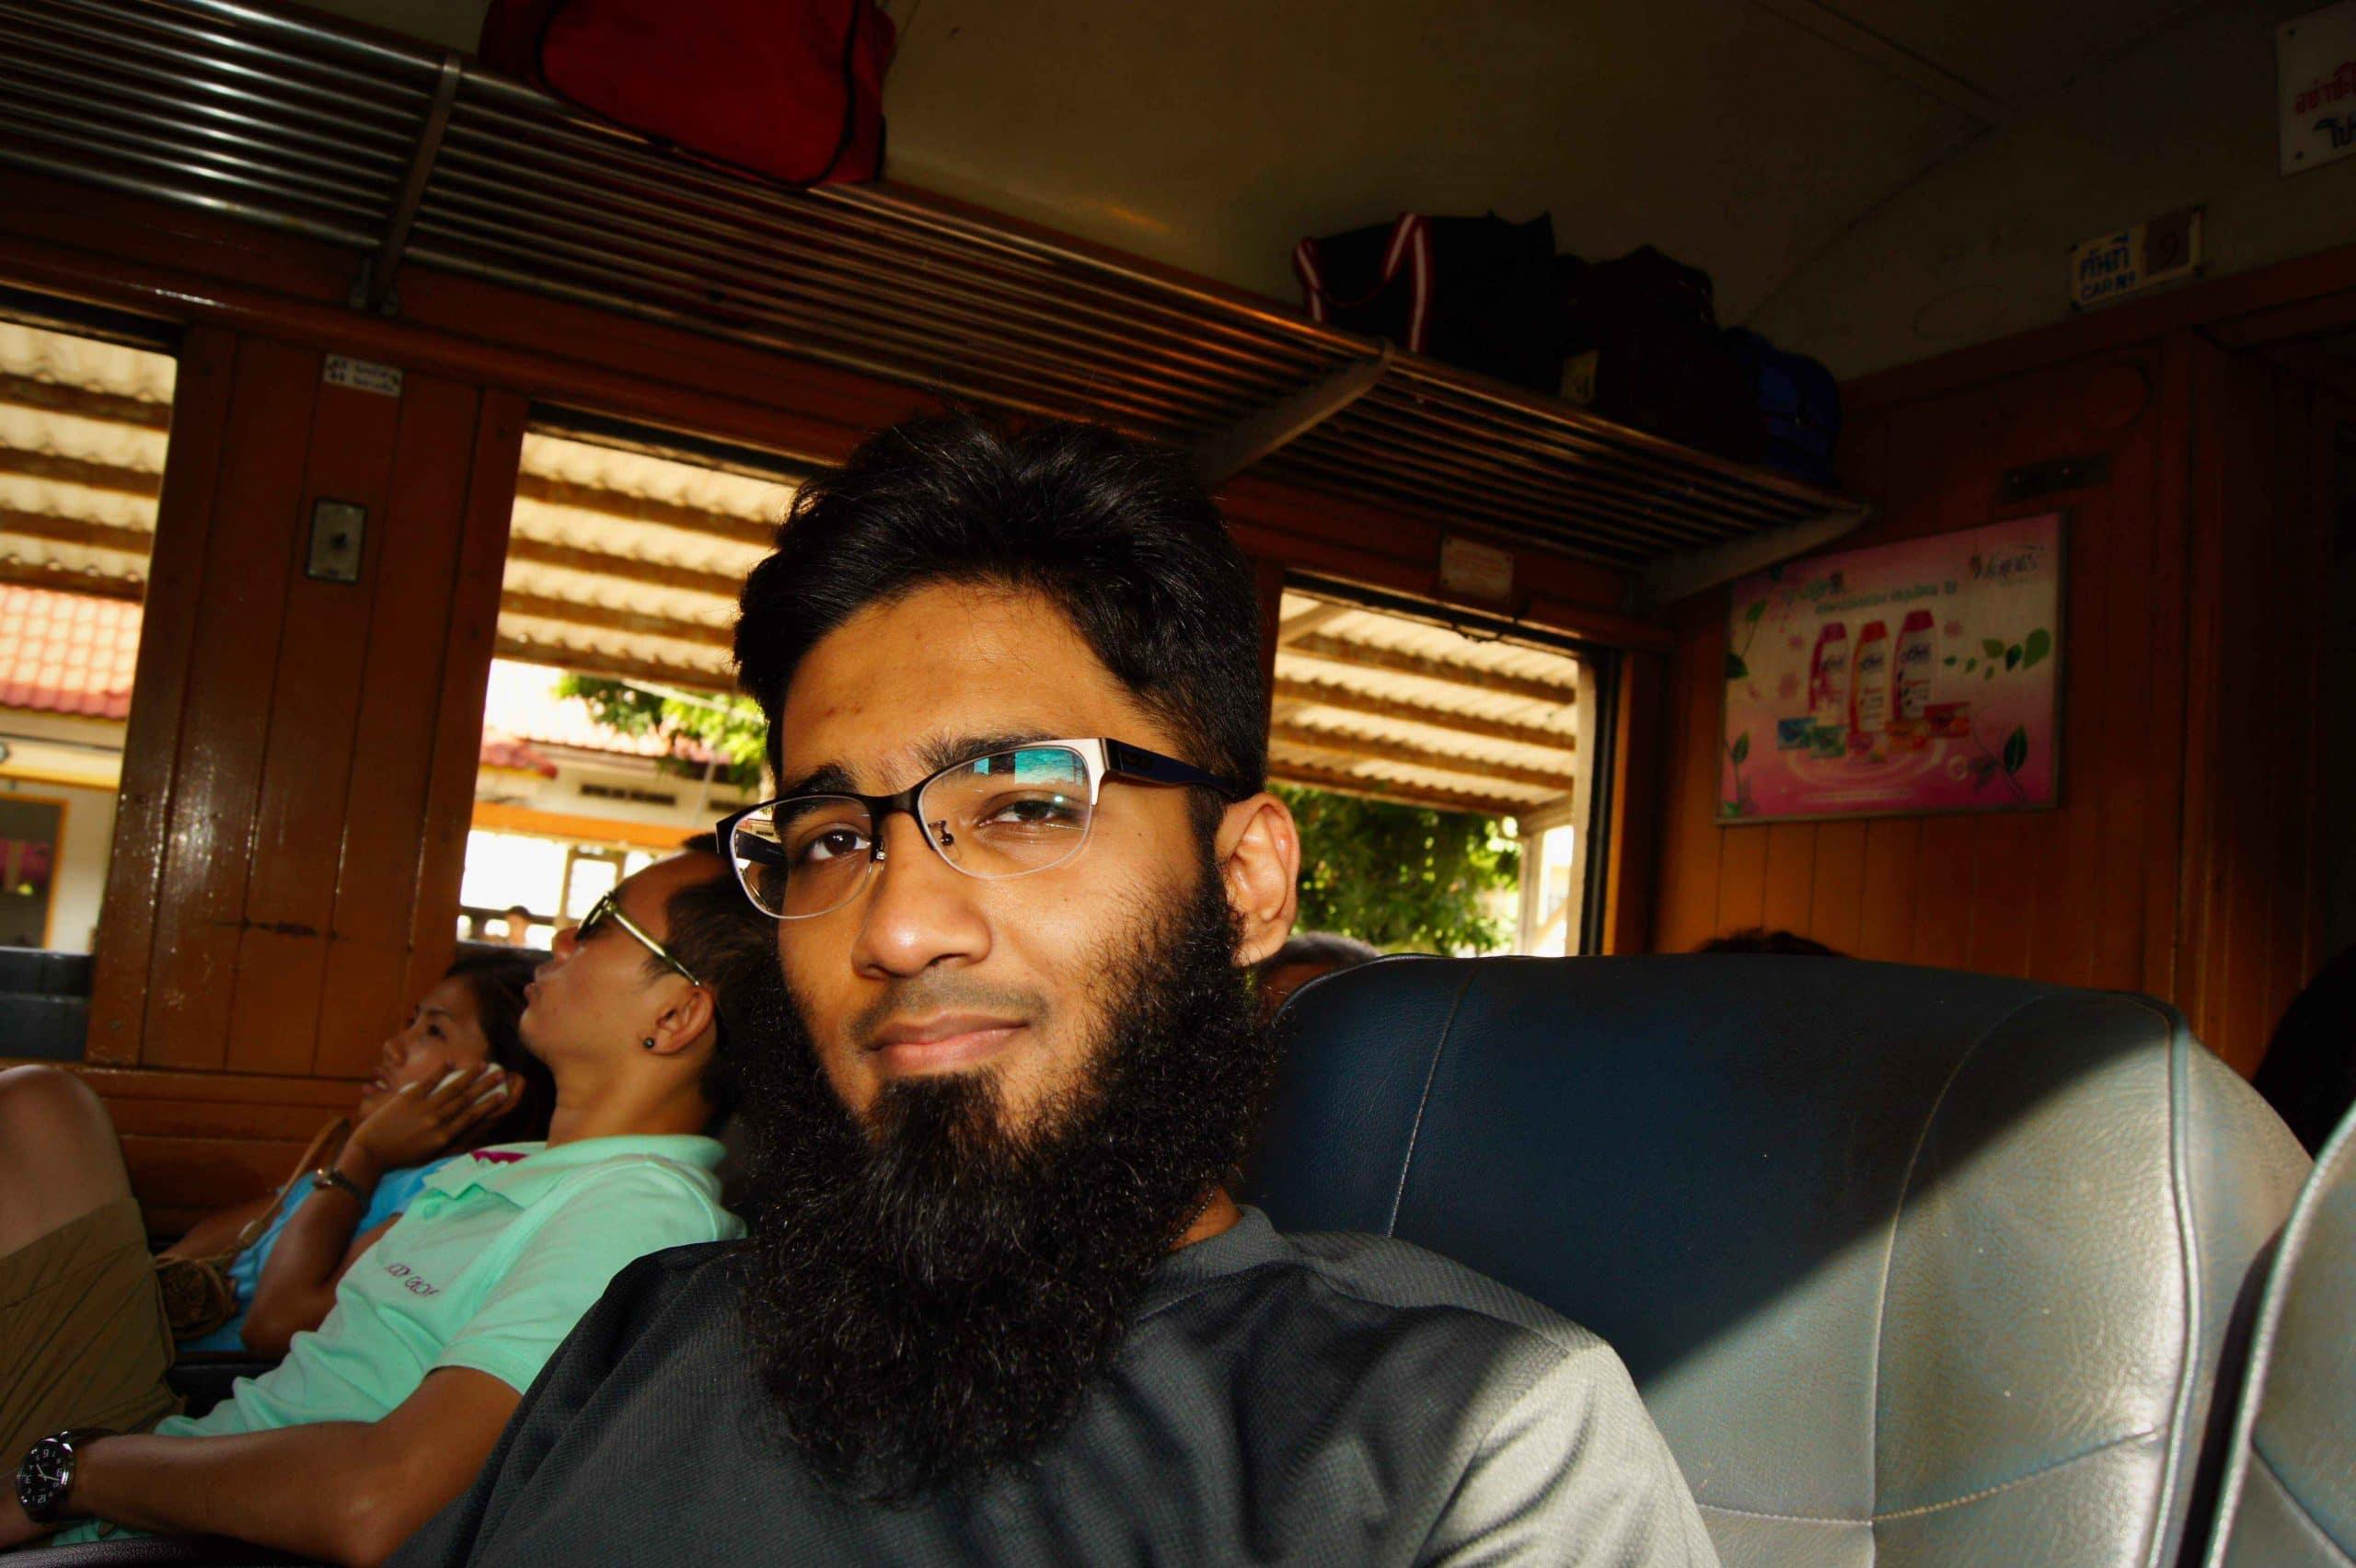 Ayutthaya to Chiang Mai Rapid Train 109